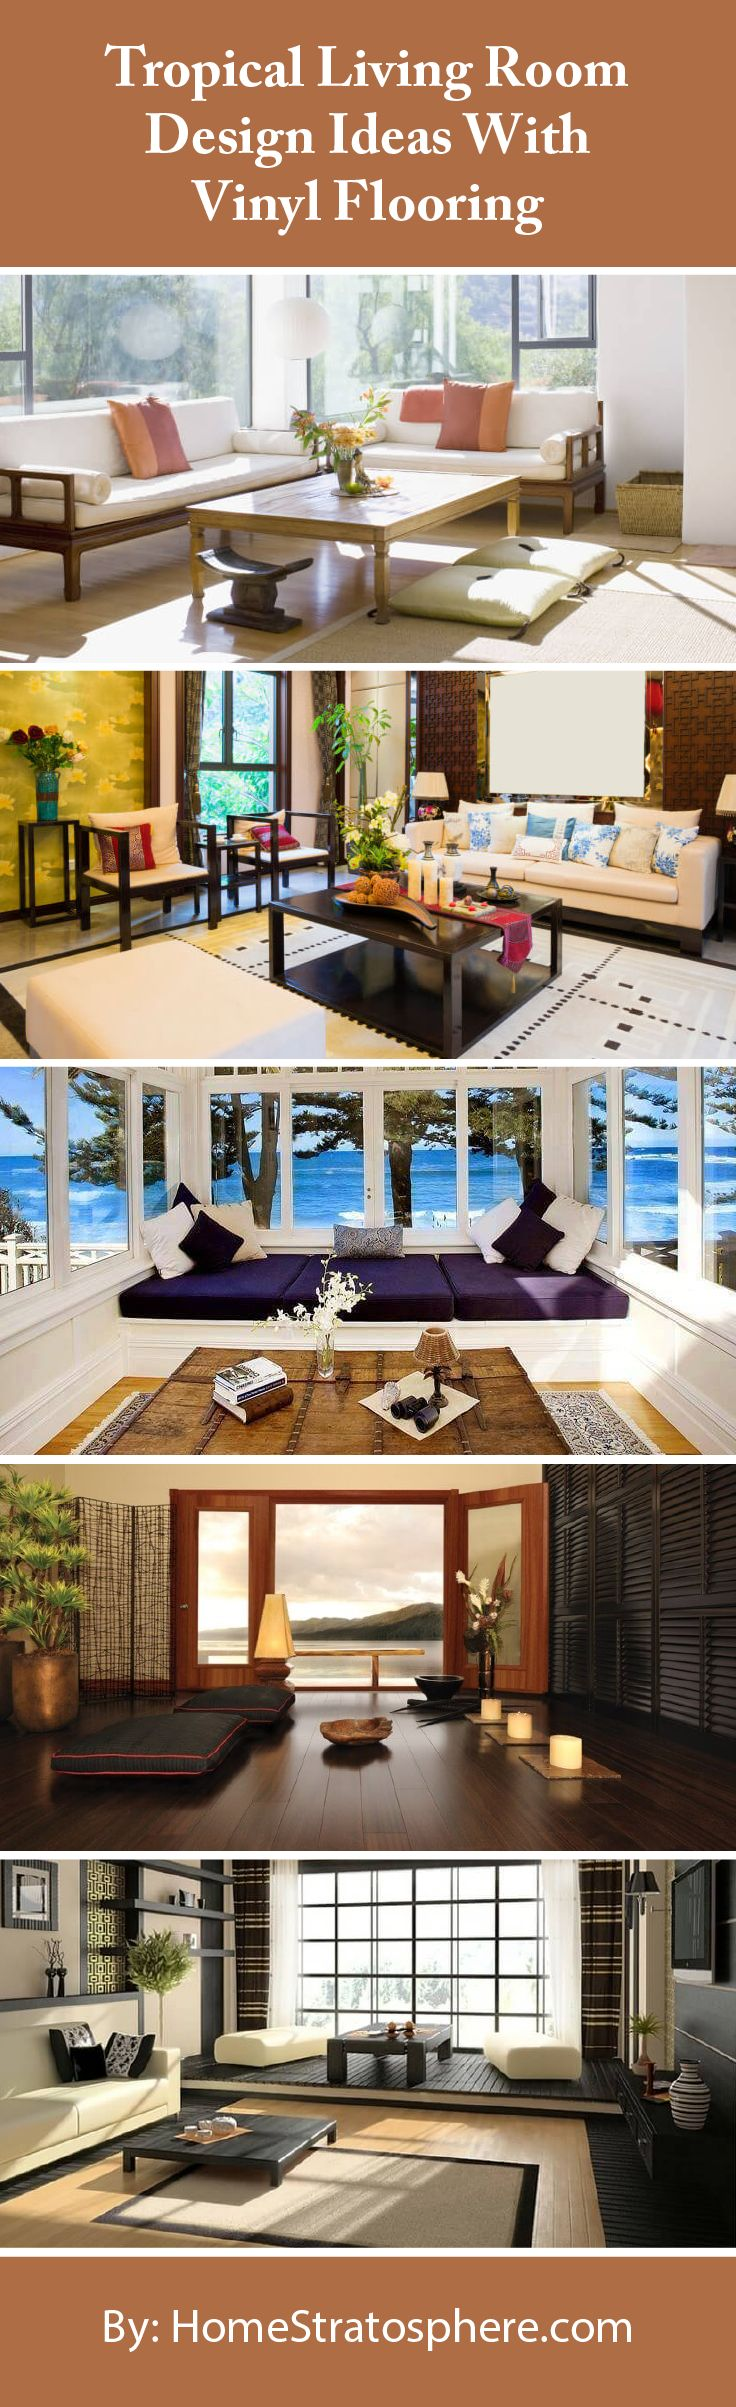 1730 best living room ideas images on pinterest | living room